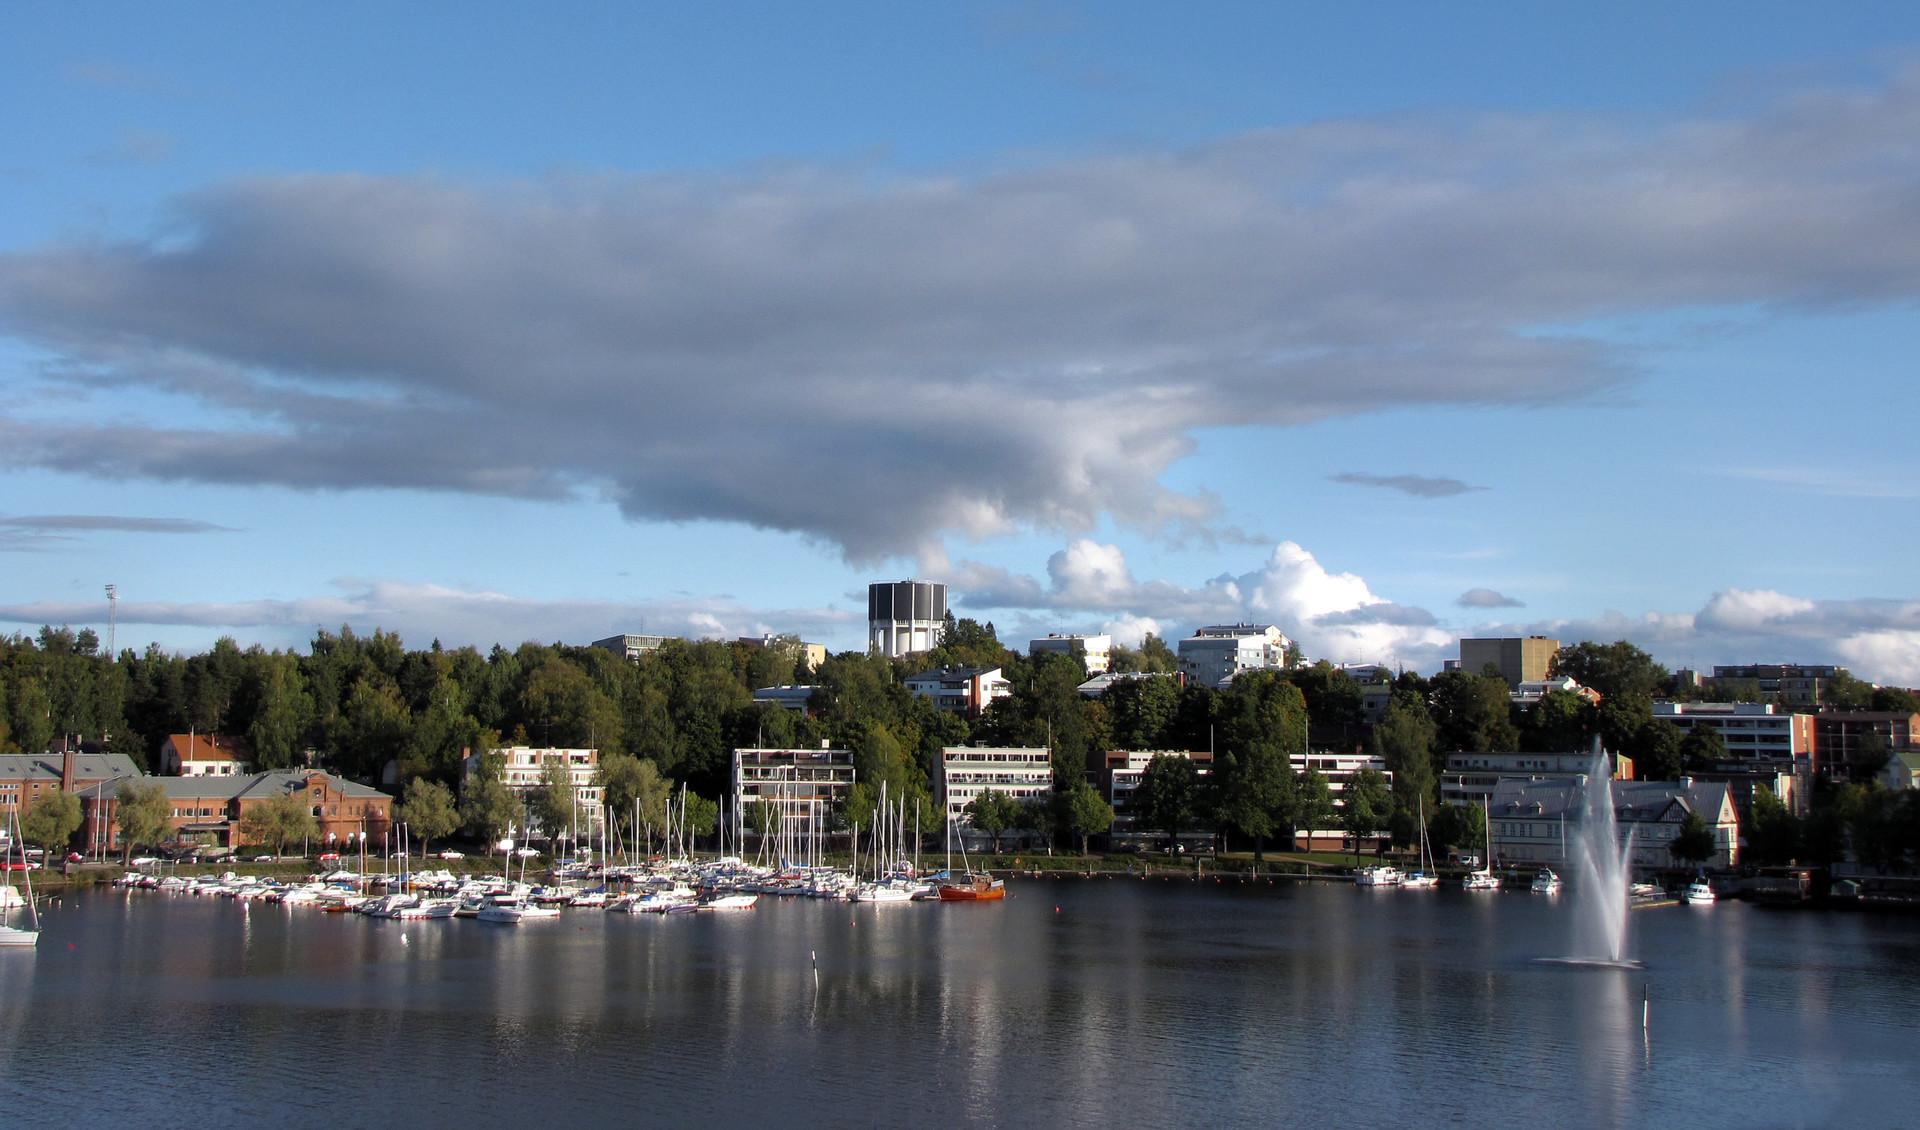 Experiência Erasmus em Lappeenranta, Finlândia, por Mithunkumar!!